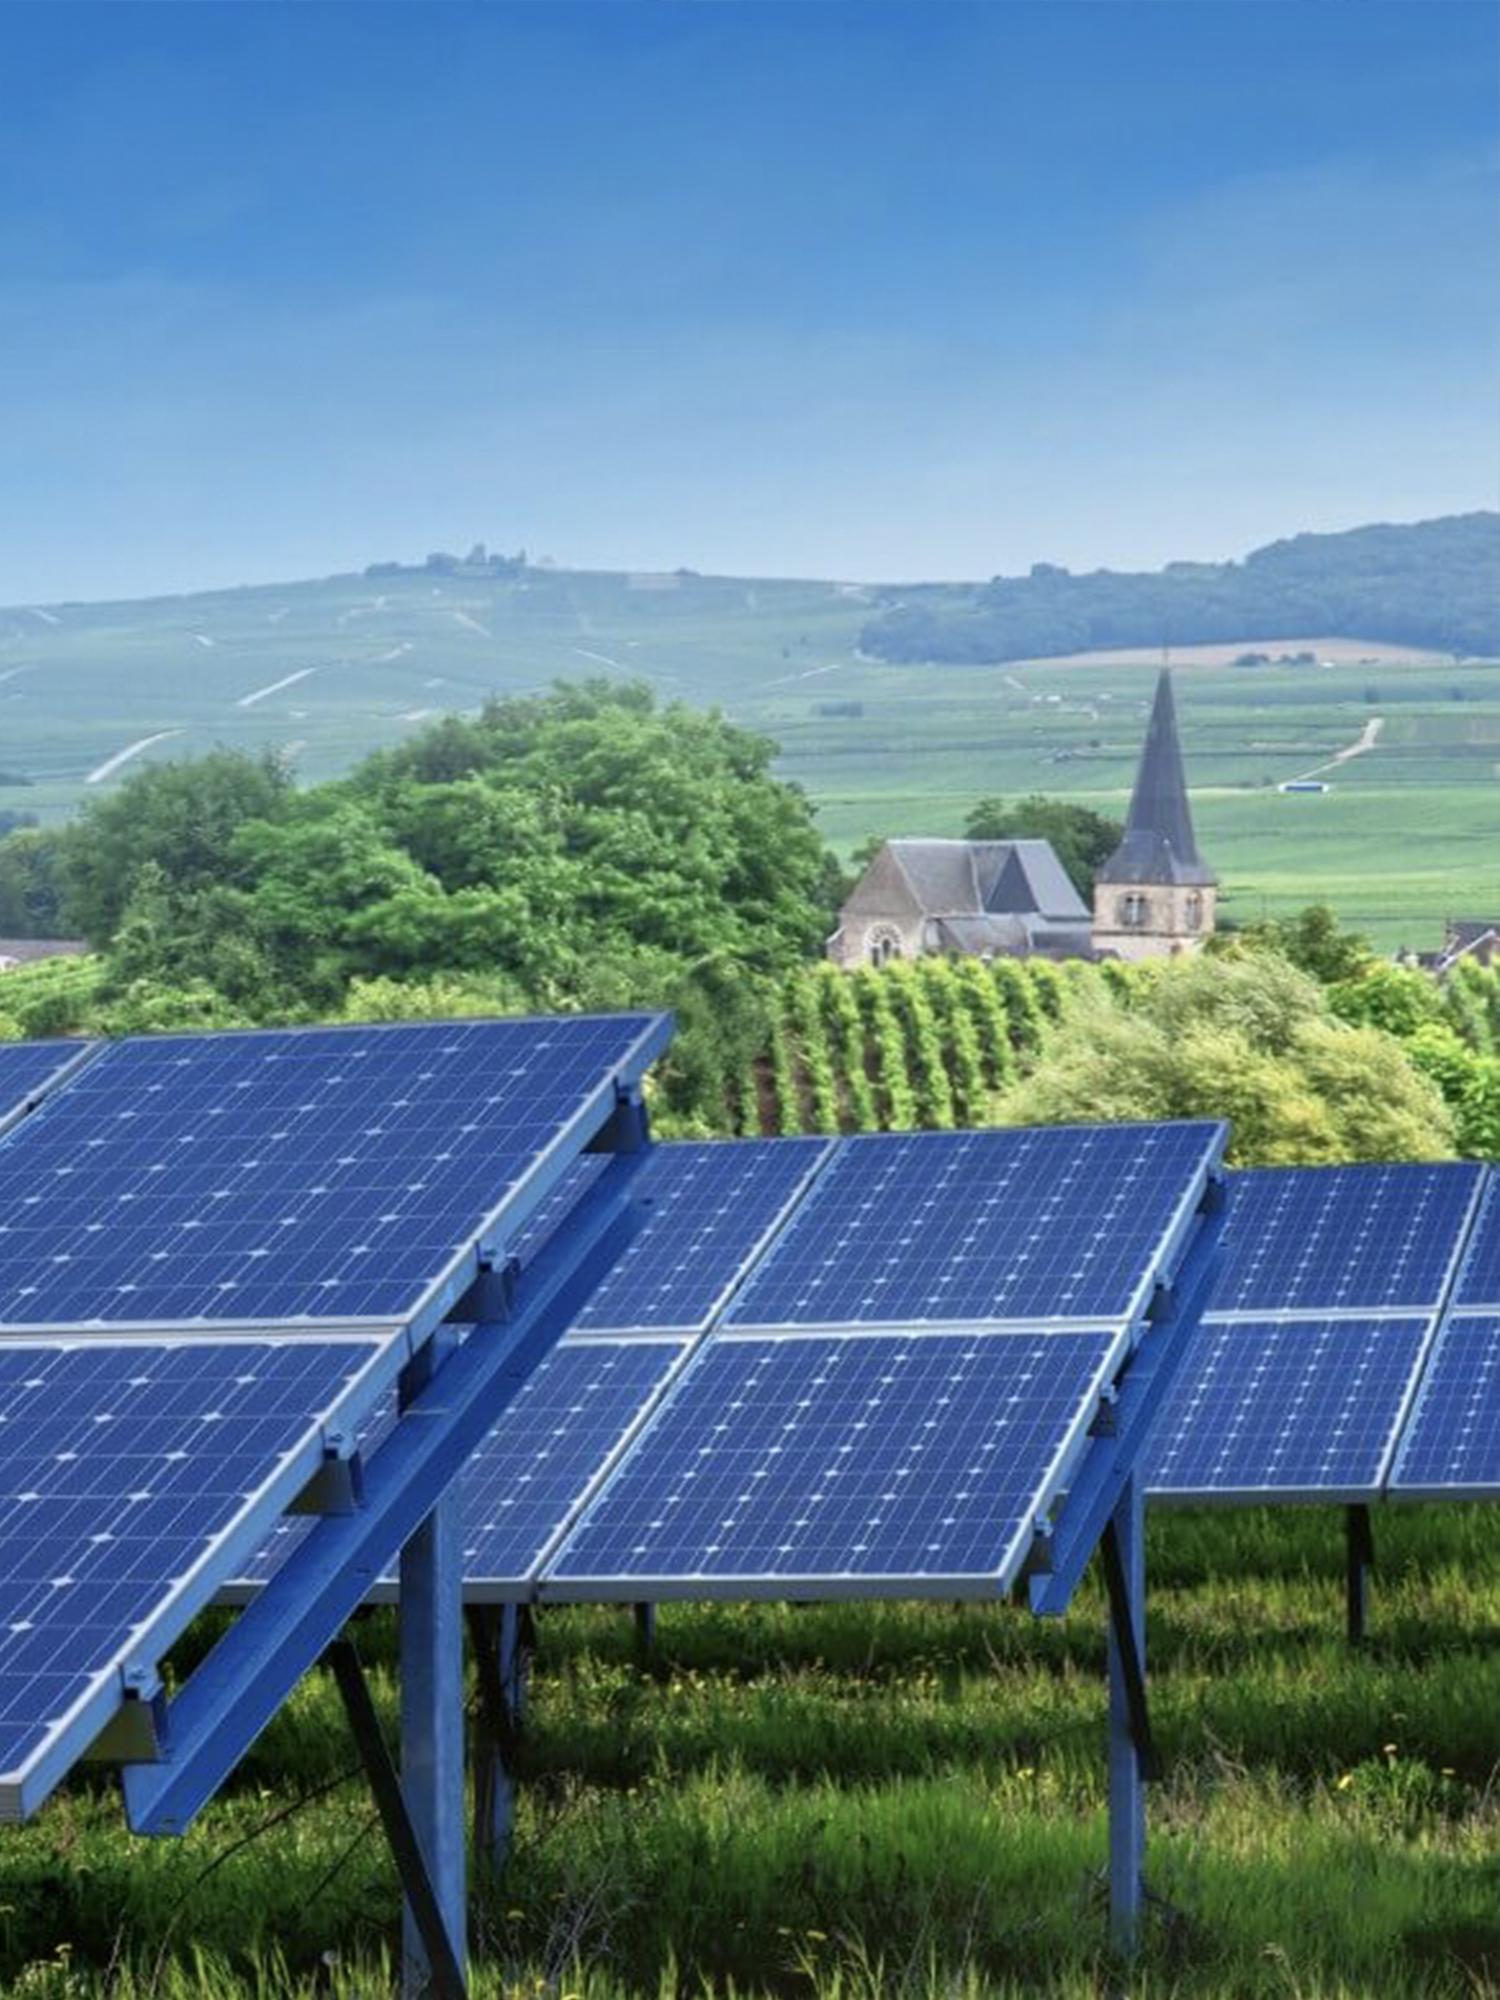 https://universalkraft.com/wp-content/uploads/2020/11/ground-solar-vertical-universal-kraft.jpg